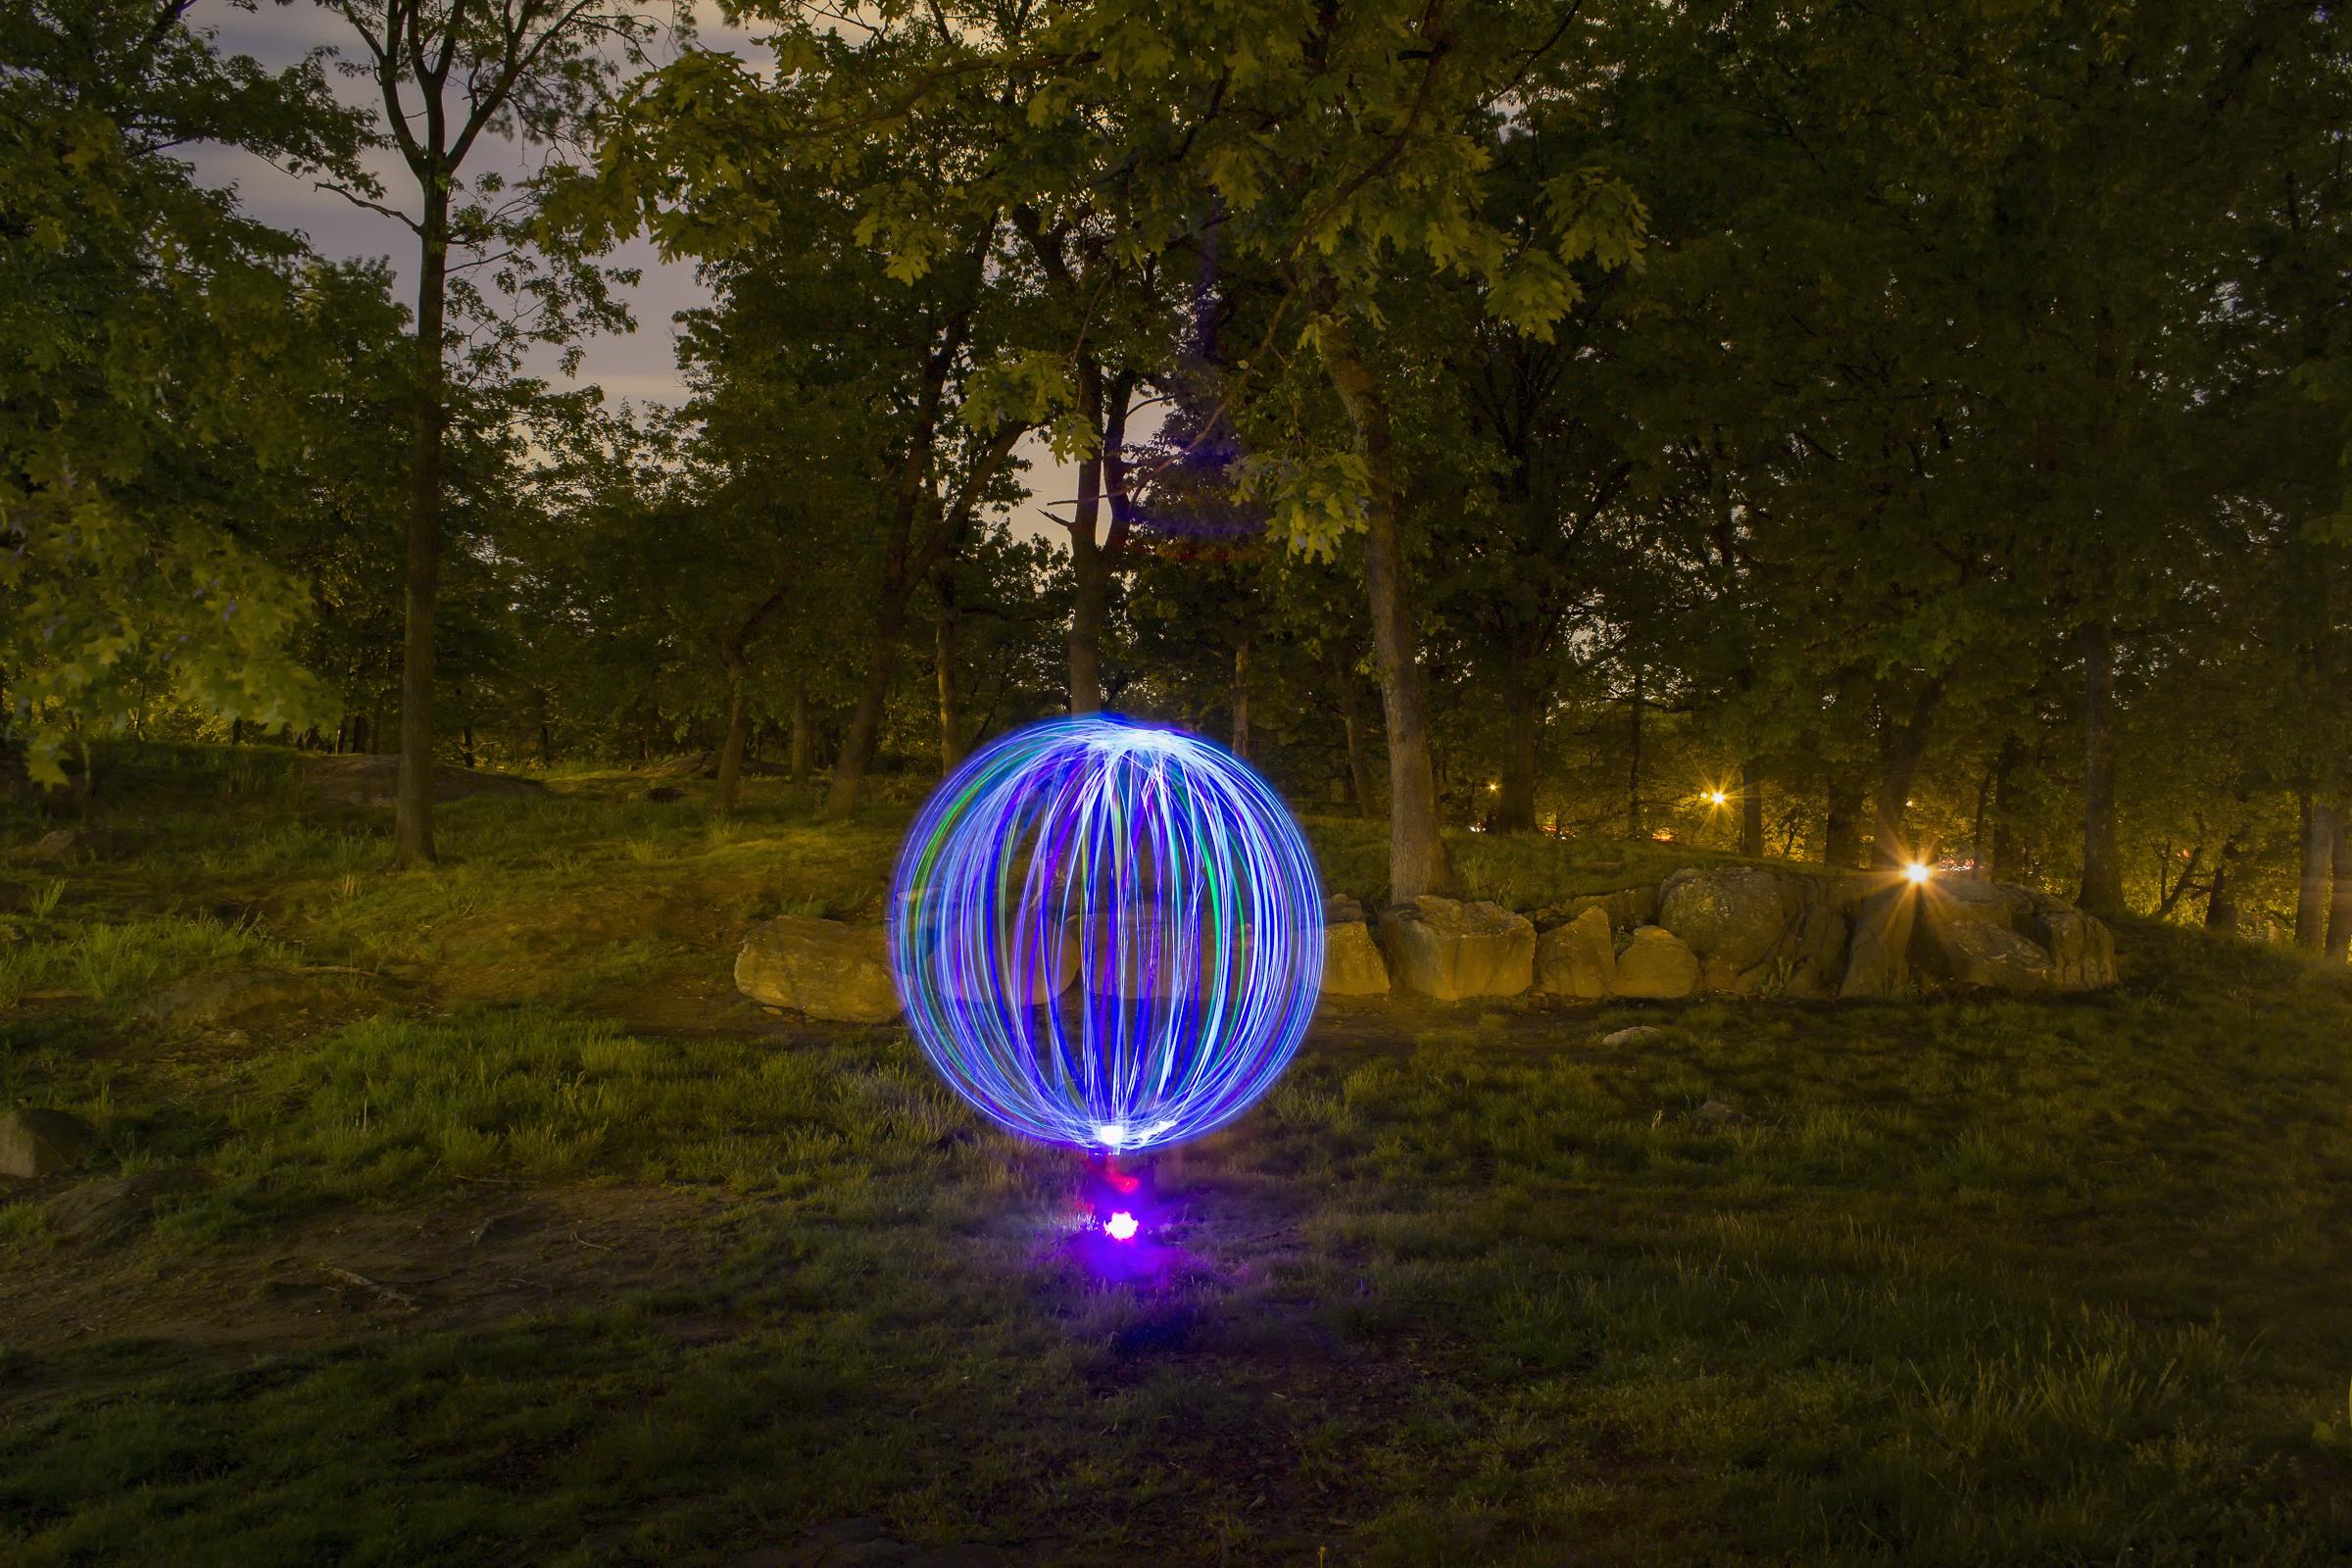 Lit Globe. New York, NY 2013 © Daniel Martinez NYC SALT